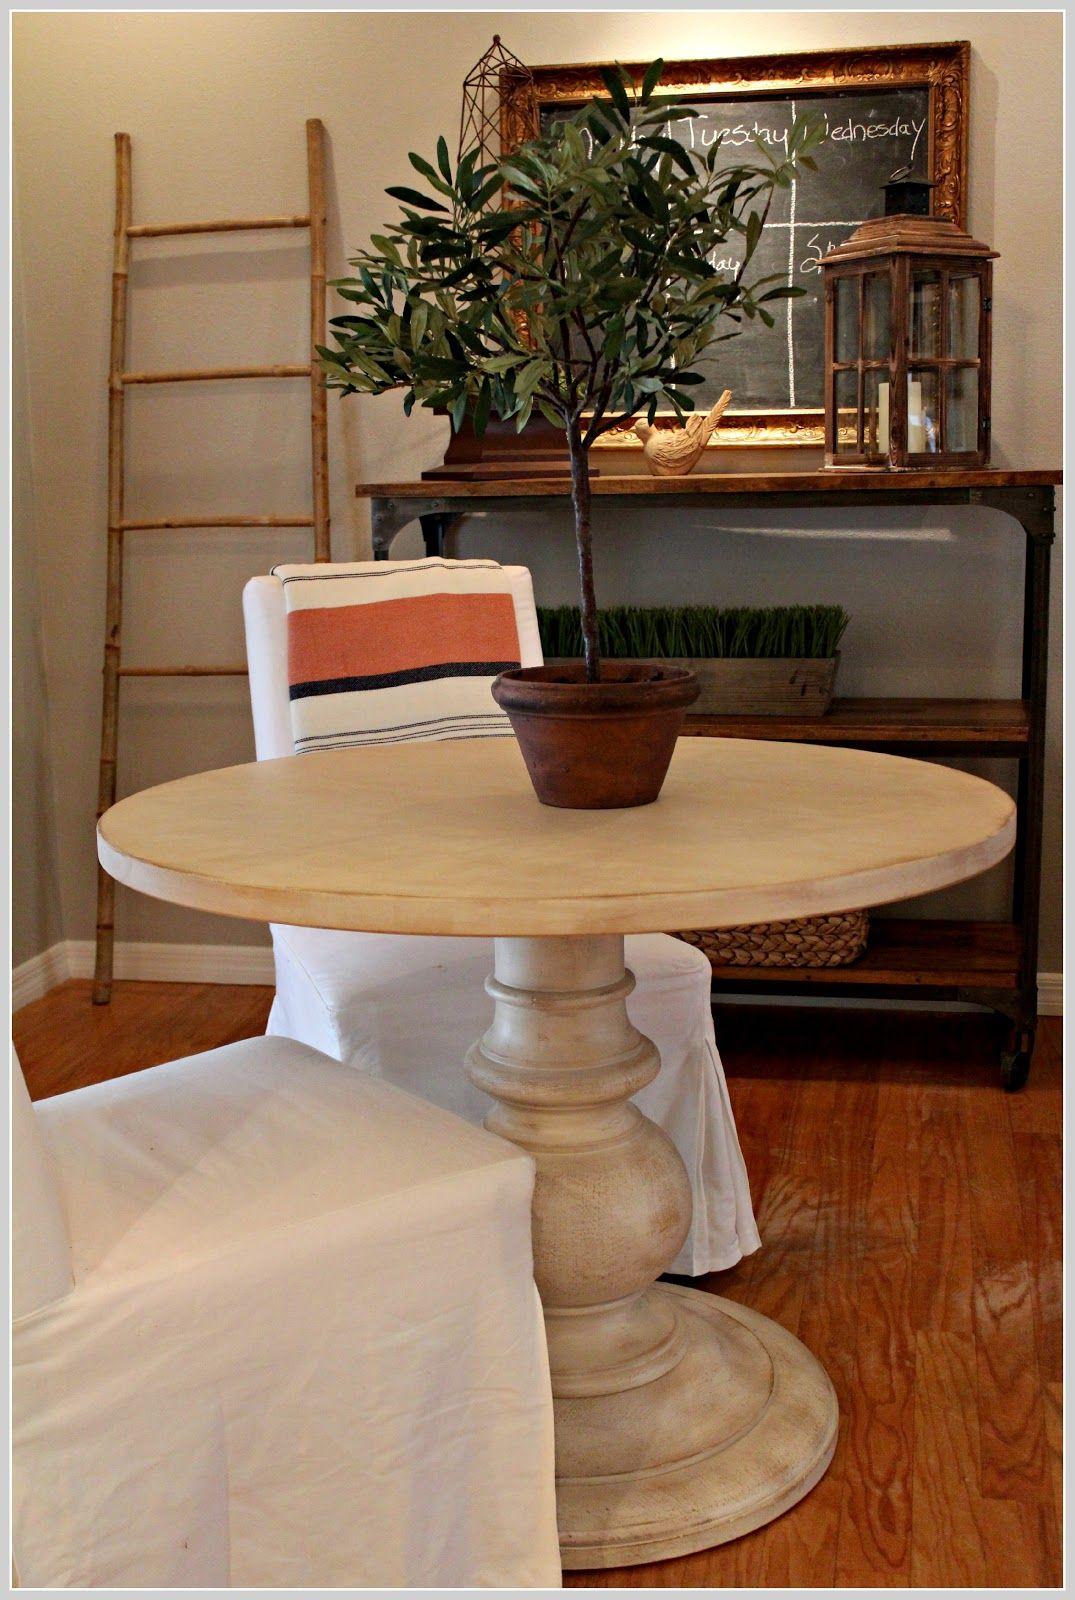 pottery barn dawson pedestal table white - Google Search  Pottery